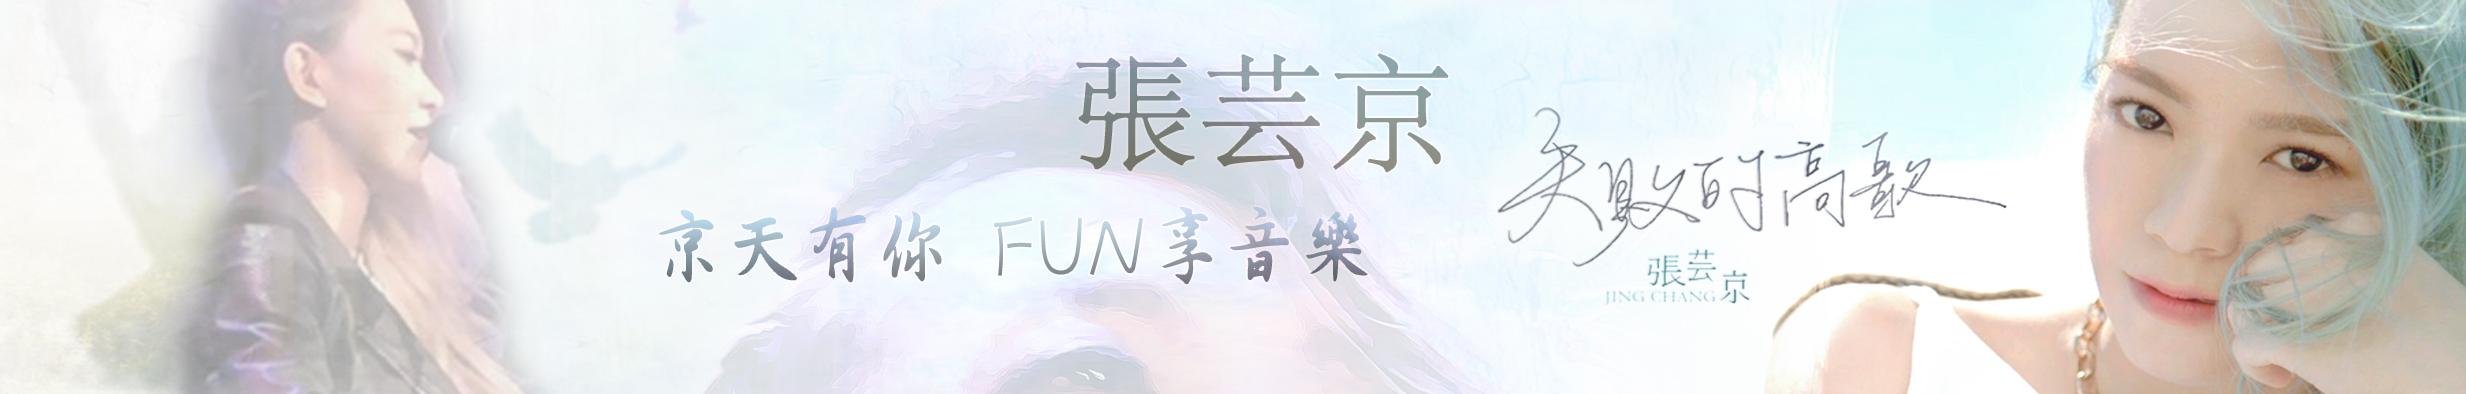 Jason薰01 banner